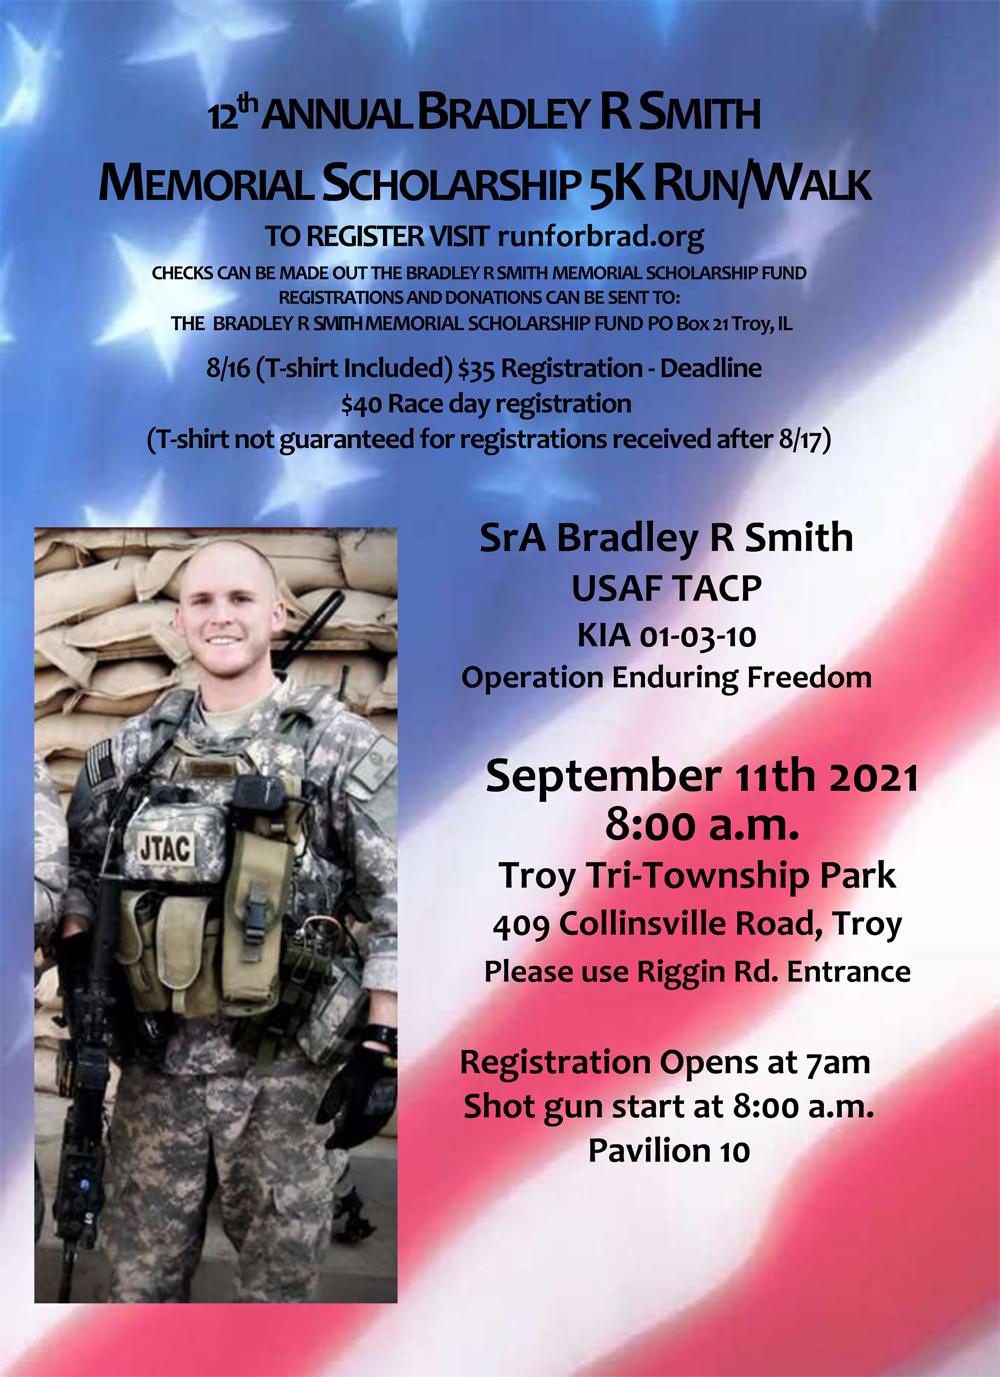 Bradley R. Smith 5K Run/Walk